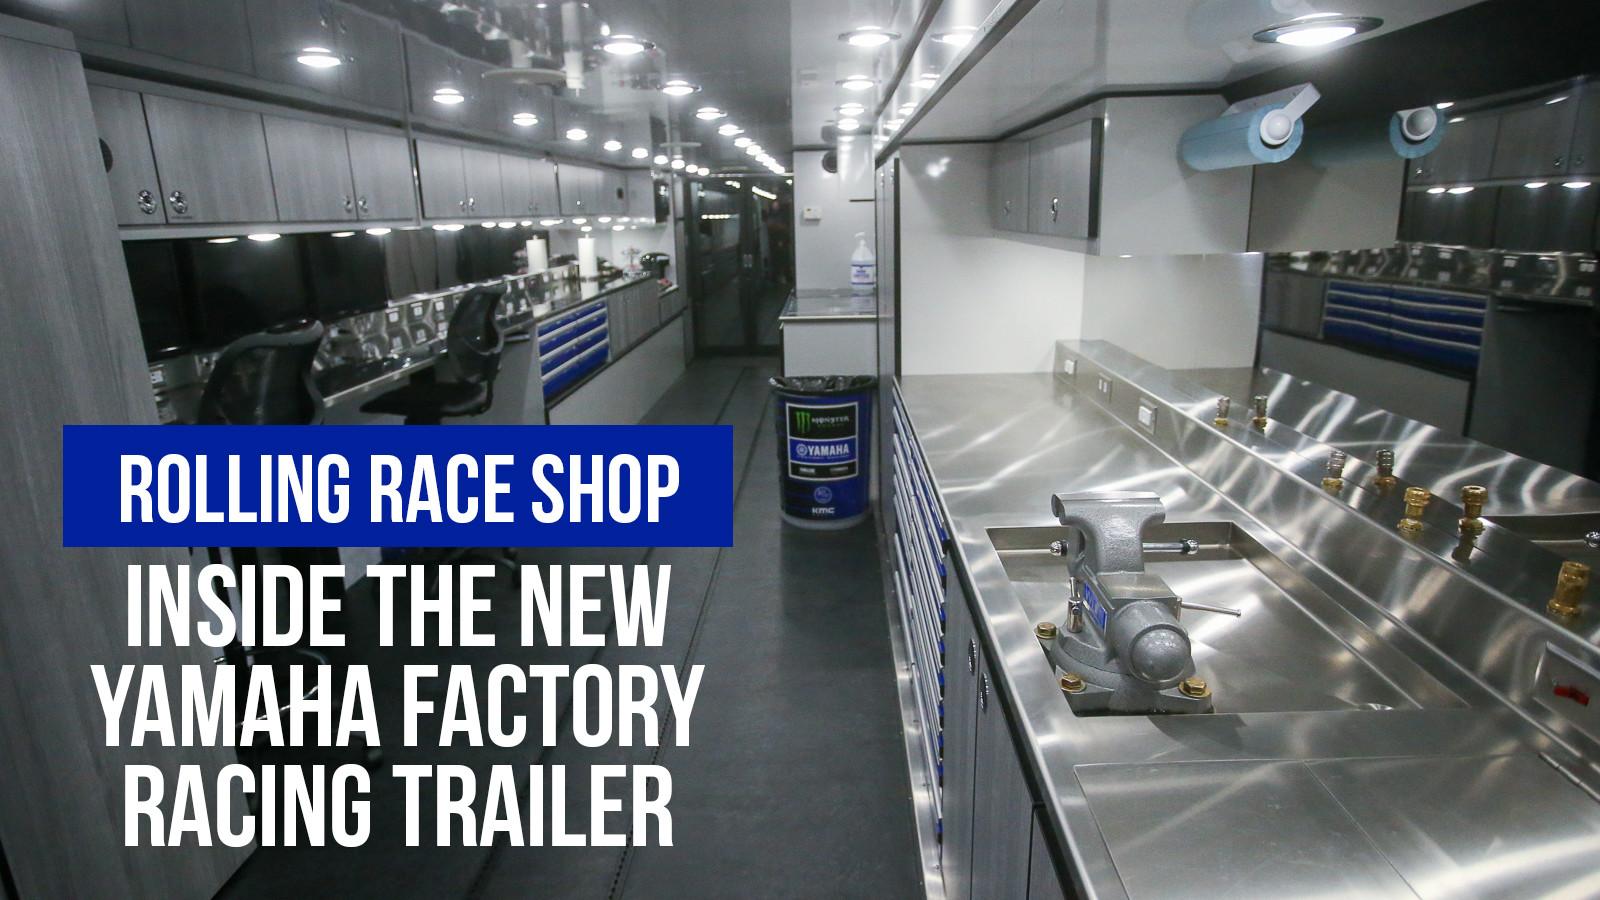 Inside The New Yamaha Factory Racing Trailer